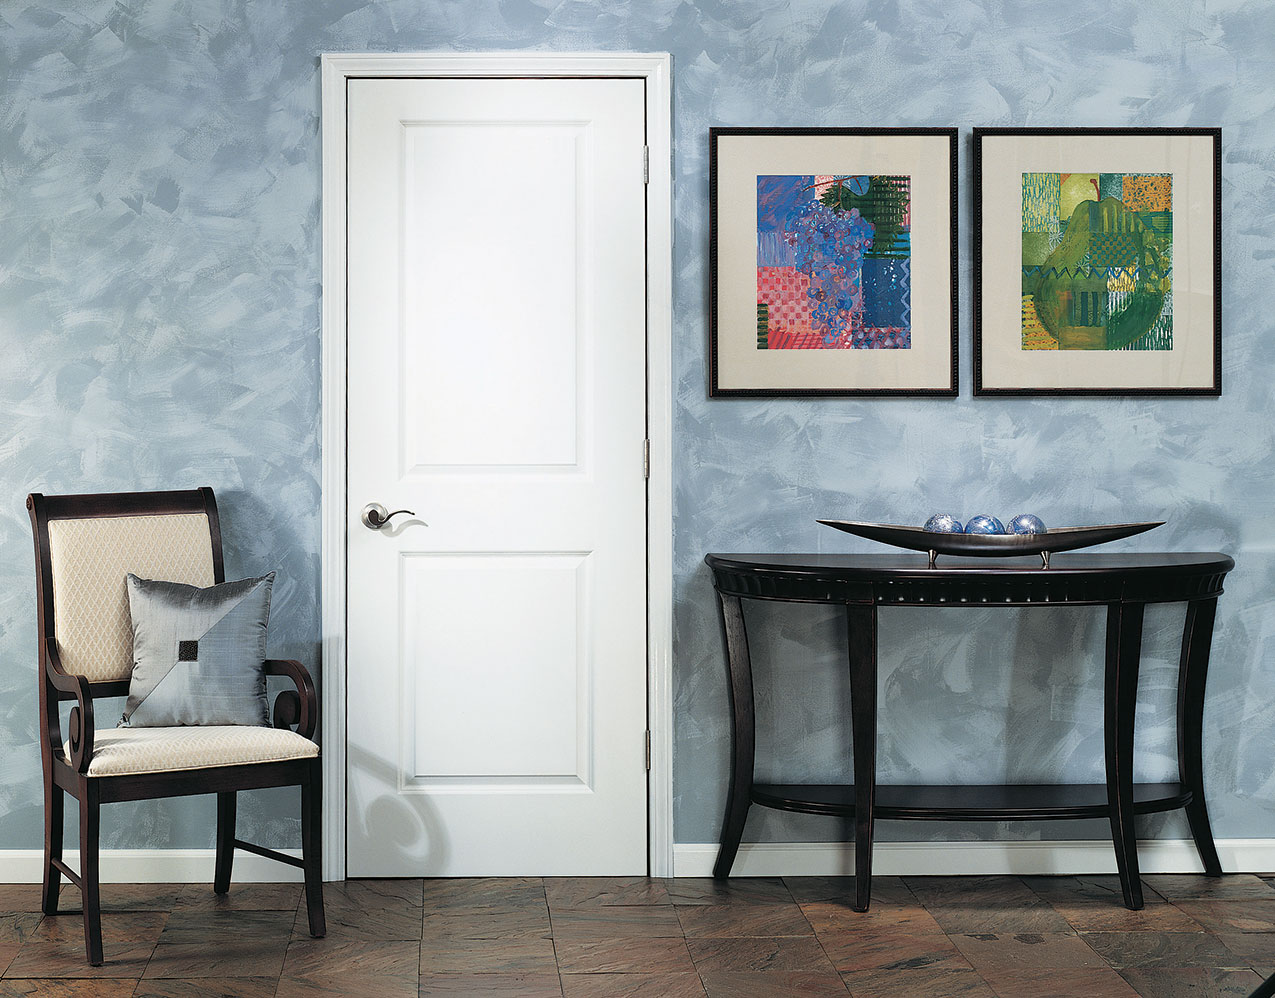 Open your World: Introducing the Carrara® Smooth Interior Door from JELD-WEN